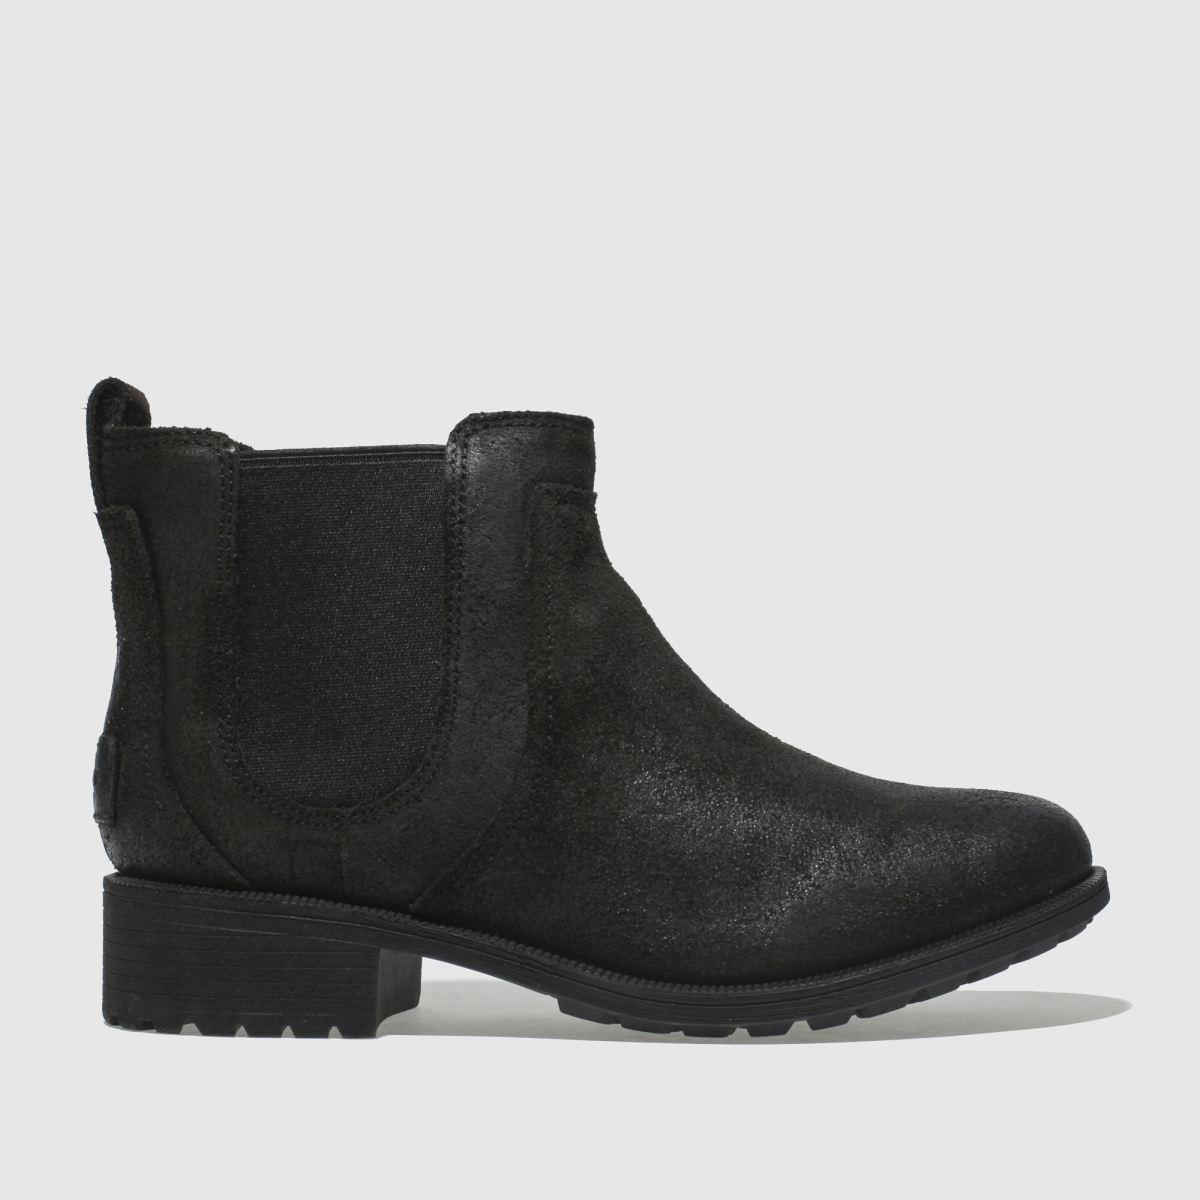 Ugg Black Bonham Ii Boots